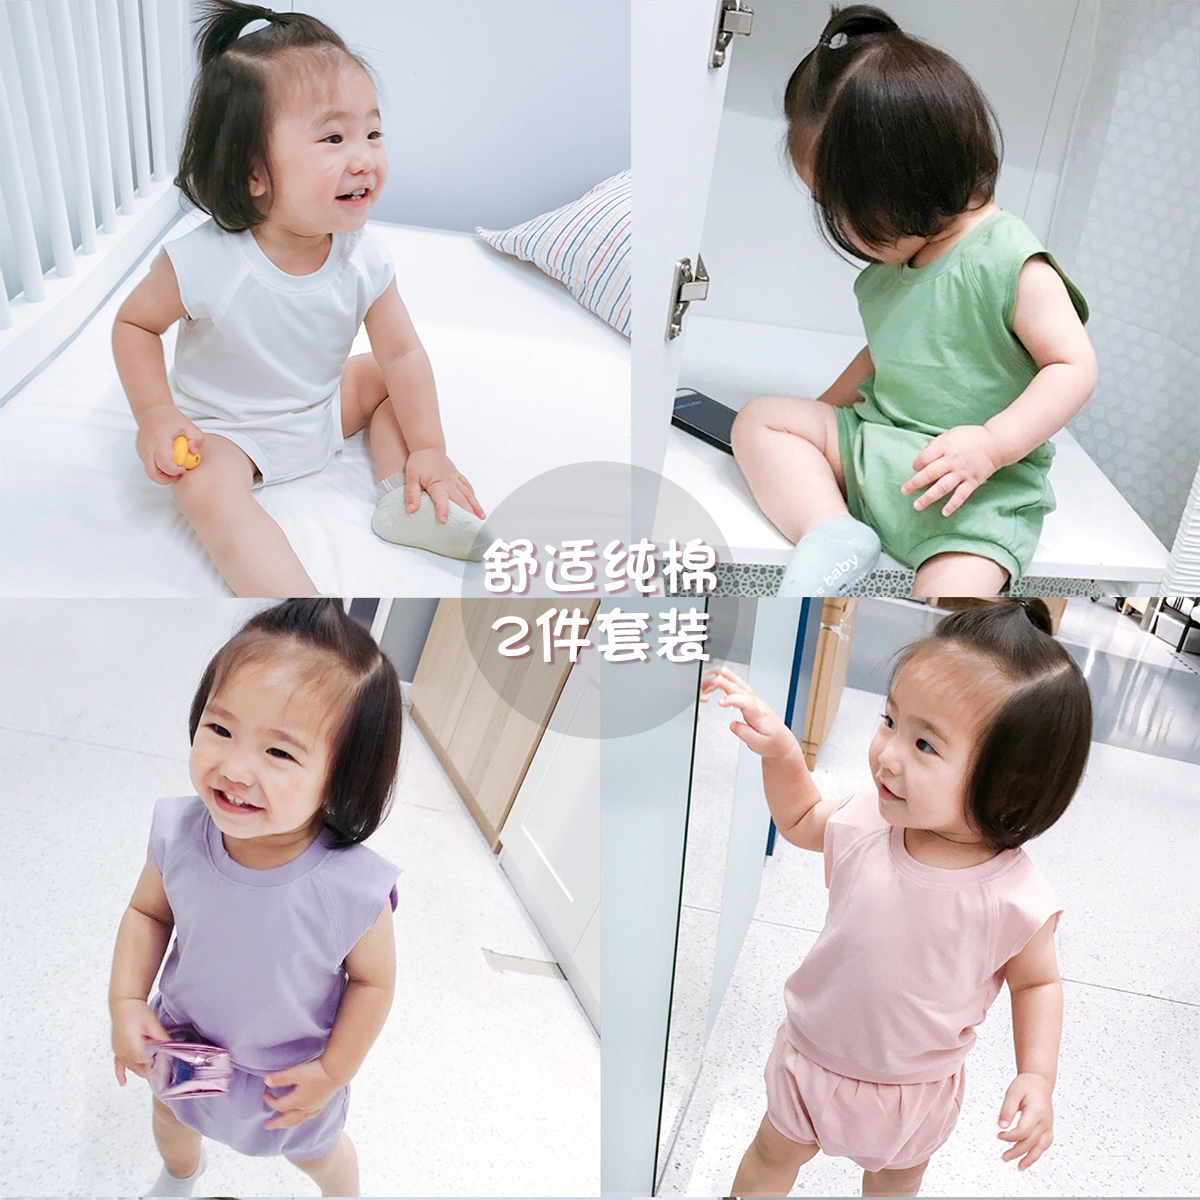 LUSON妈 婴儿睡衣套装夏装薄款无袖上衣短裤两件套女宝宝家居服